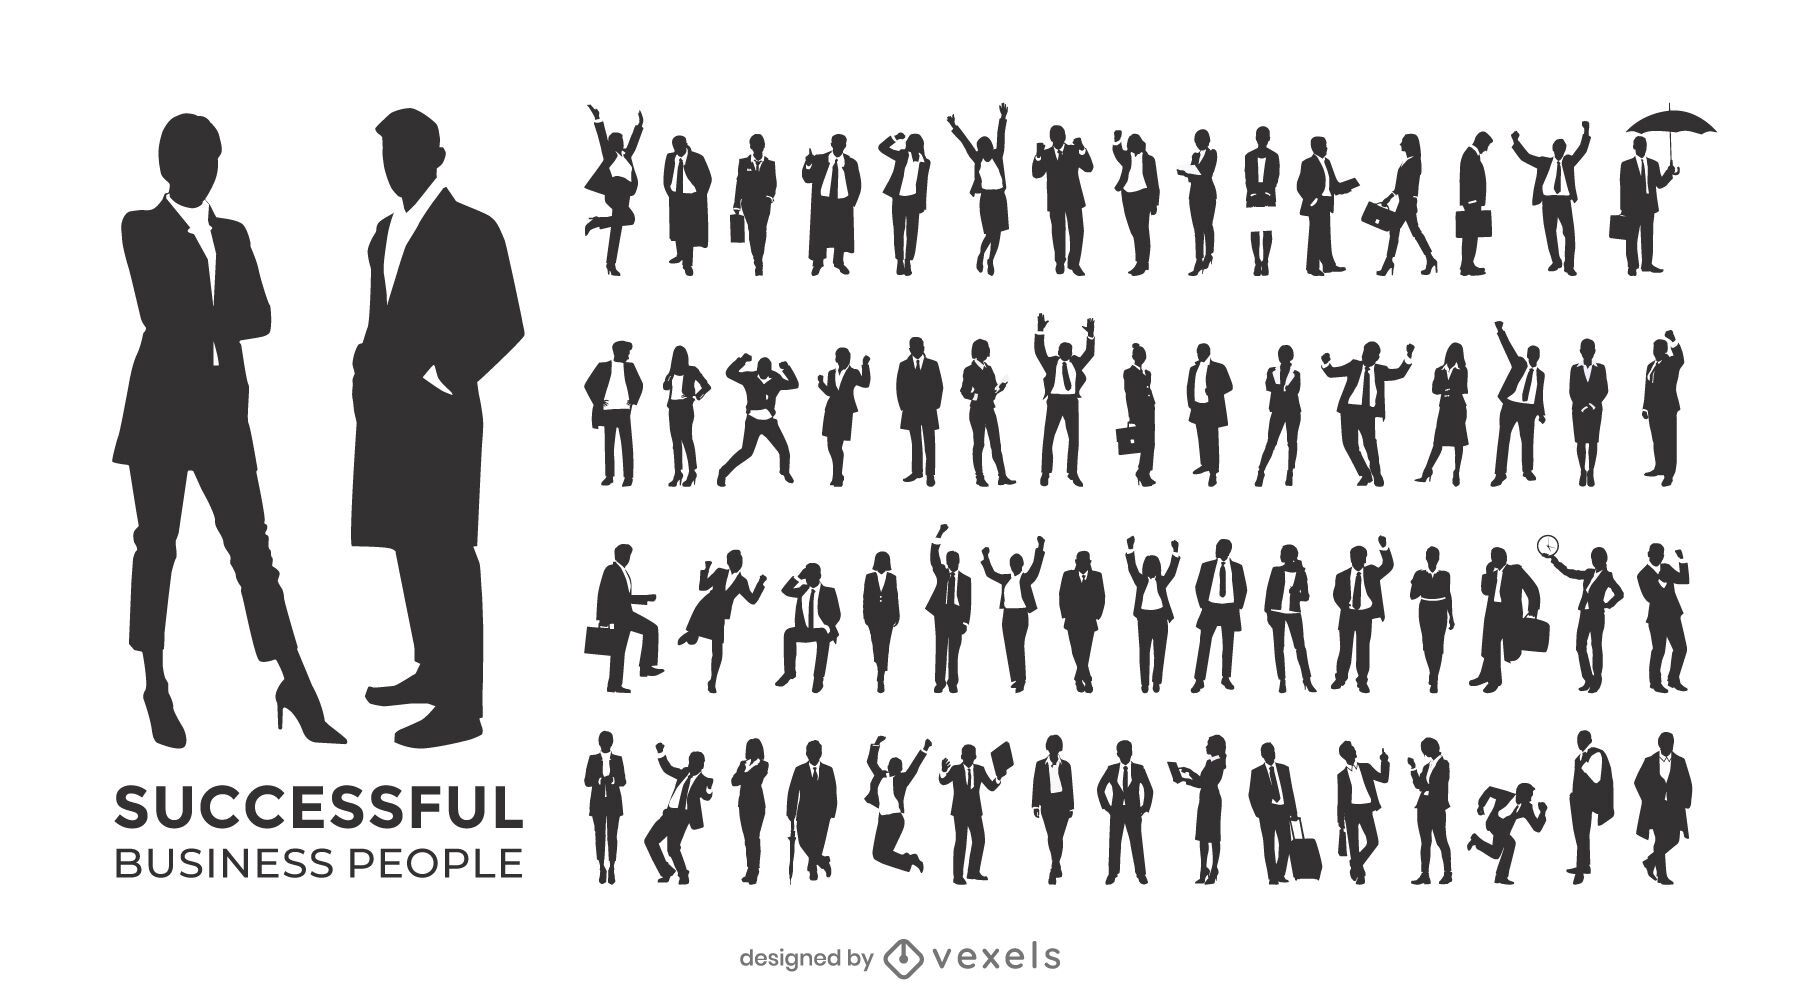 Successful business people silhouette set